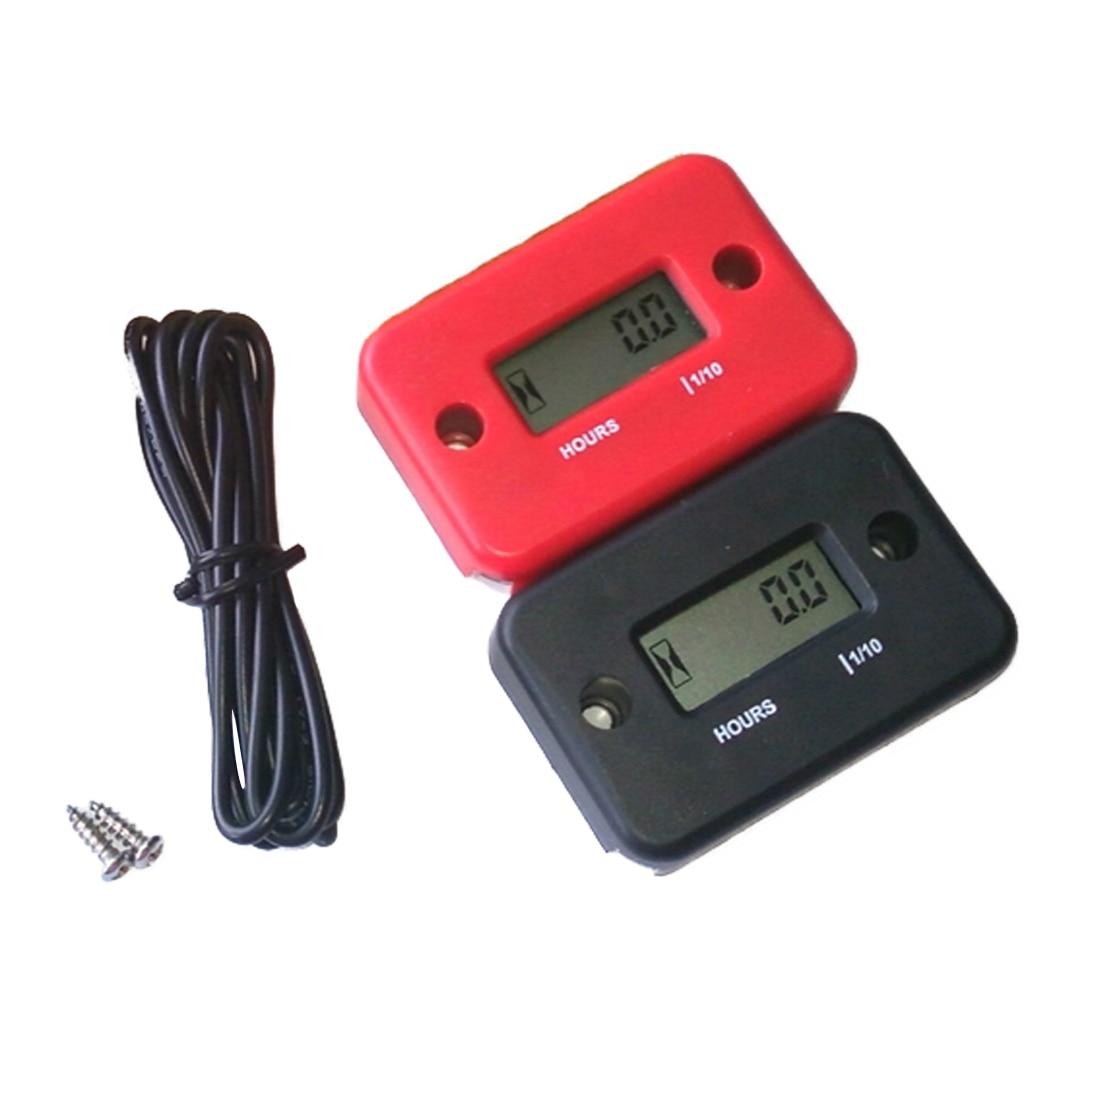 Medidor Digital de horas del motor, impermeable, LCD, reloj de arena para motocicleta, moto de cross, Marina, ATV, moto de nieve